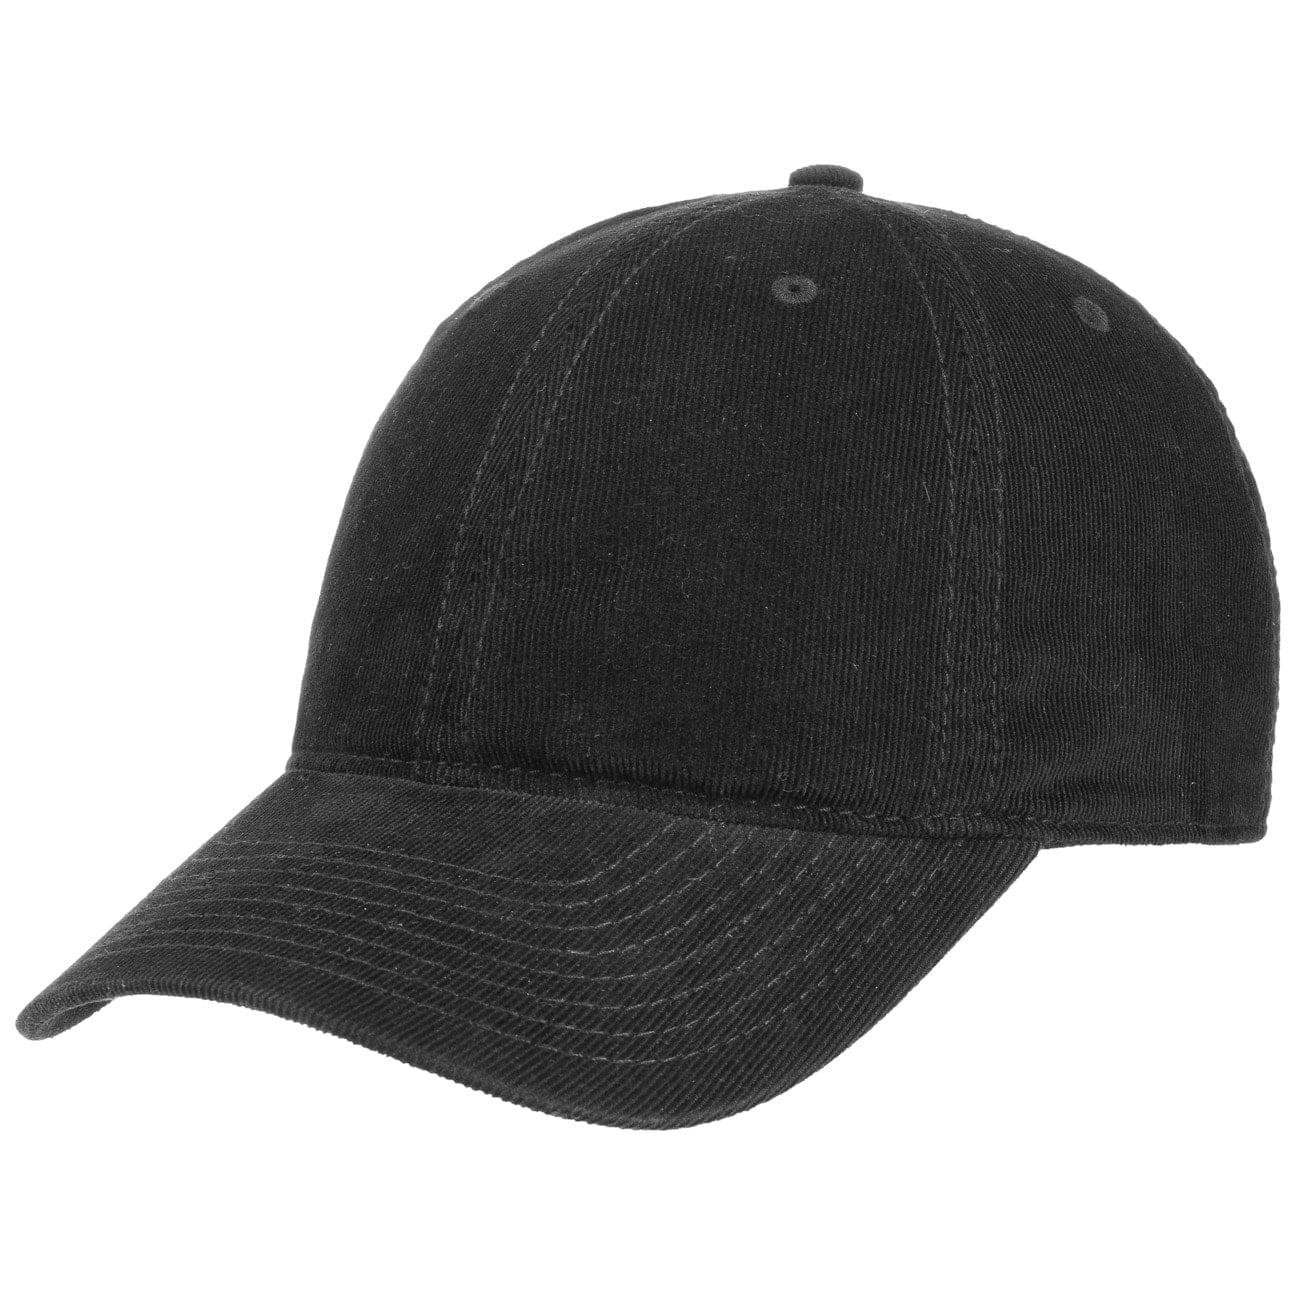 creep-baseballcap-strapback-cap